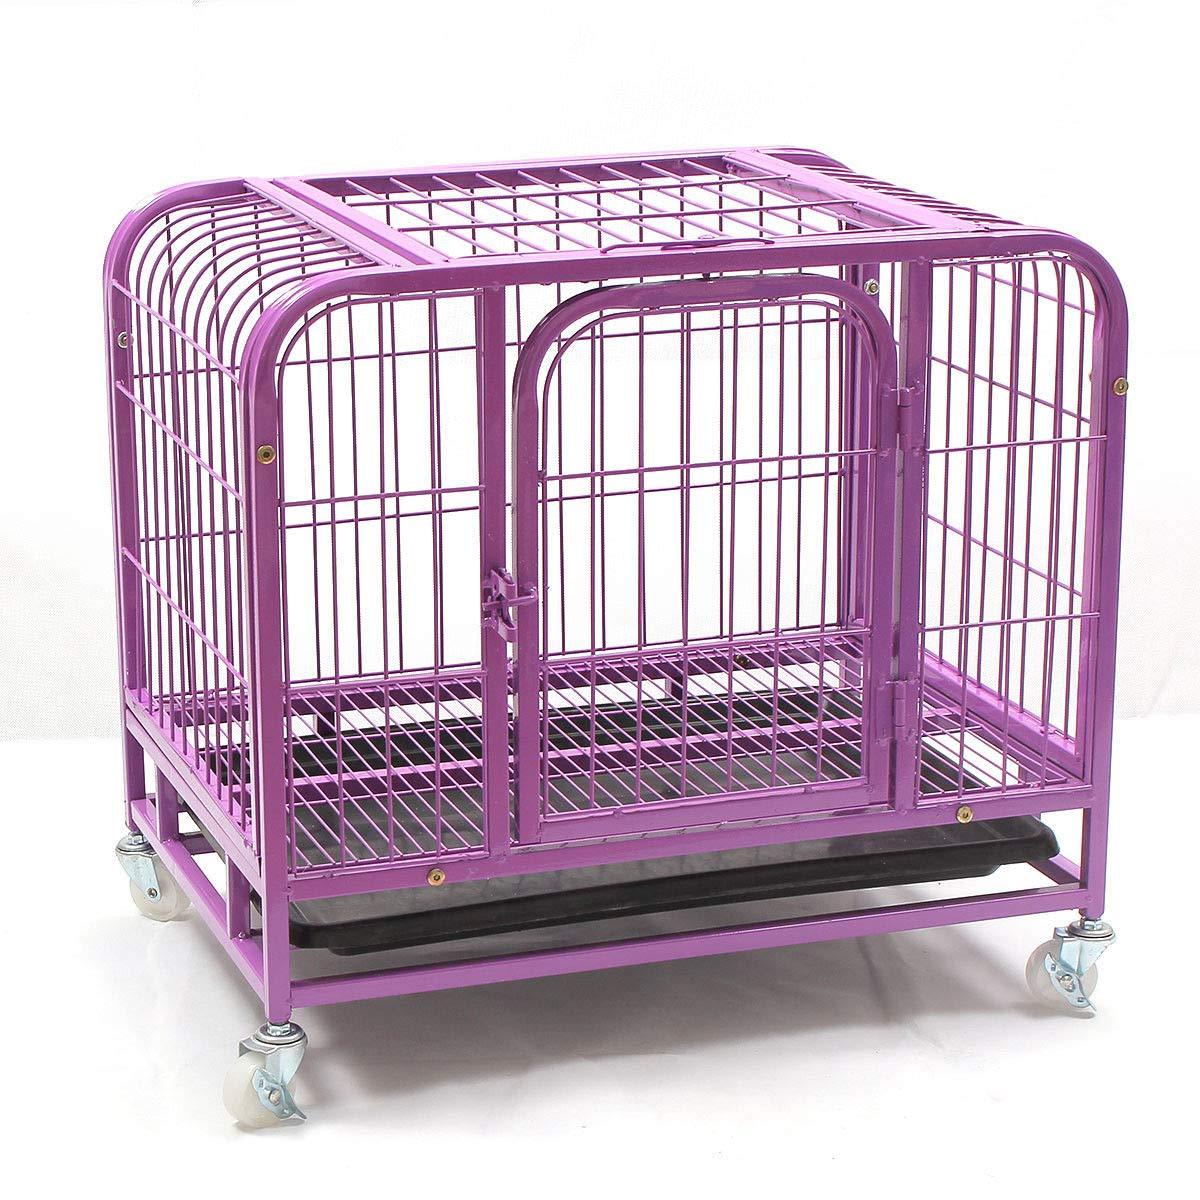 Generic.El cassa in acciaio er Animal Carrier ruote Fol Pet Dog Ty Pet extra large Heavy-Duty Larg gabbia pieghevole grande ha